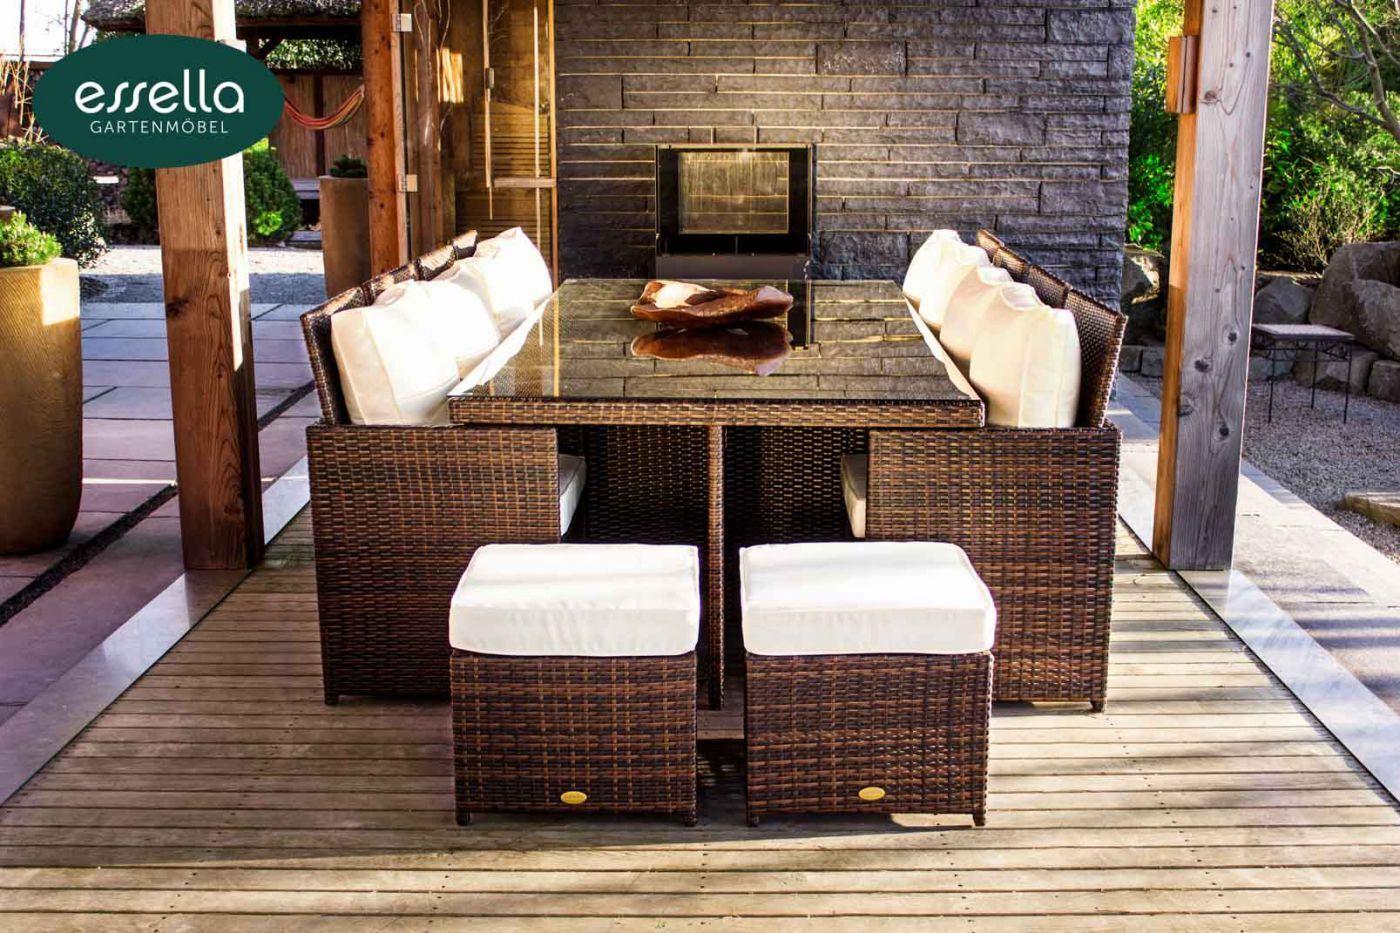 essella polyrattan sitzgruppe gartenm bel essgruppe rattan. Black Bedroom Furniture Sets. Home Design Ideas